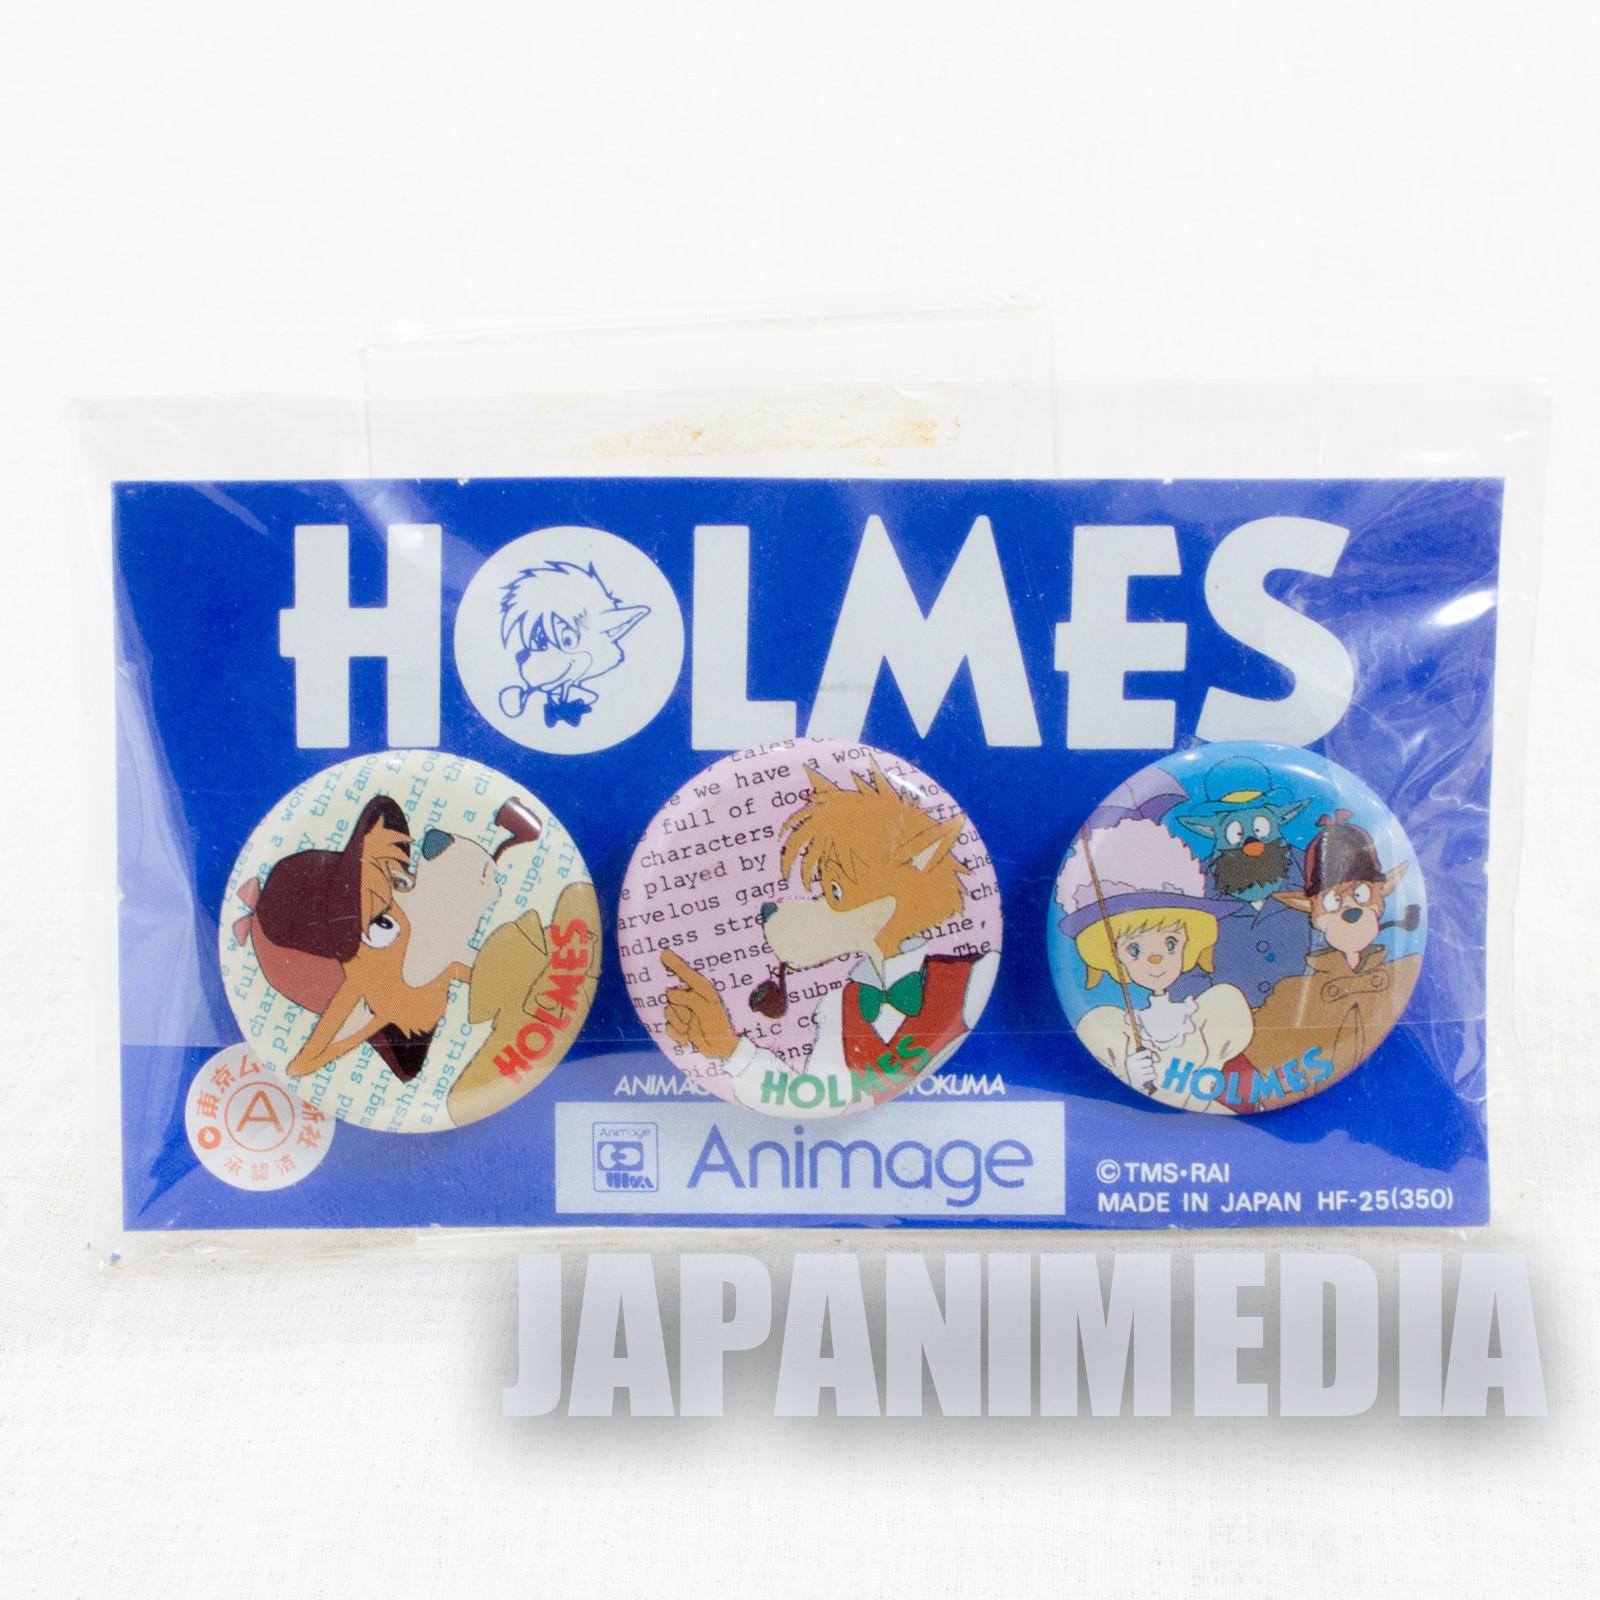 RARE!! The Detective Holmes Button badge 3pc Set Ghibli Hayao Miyazaki JAPAN